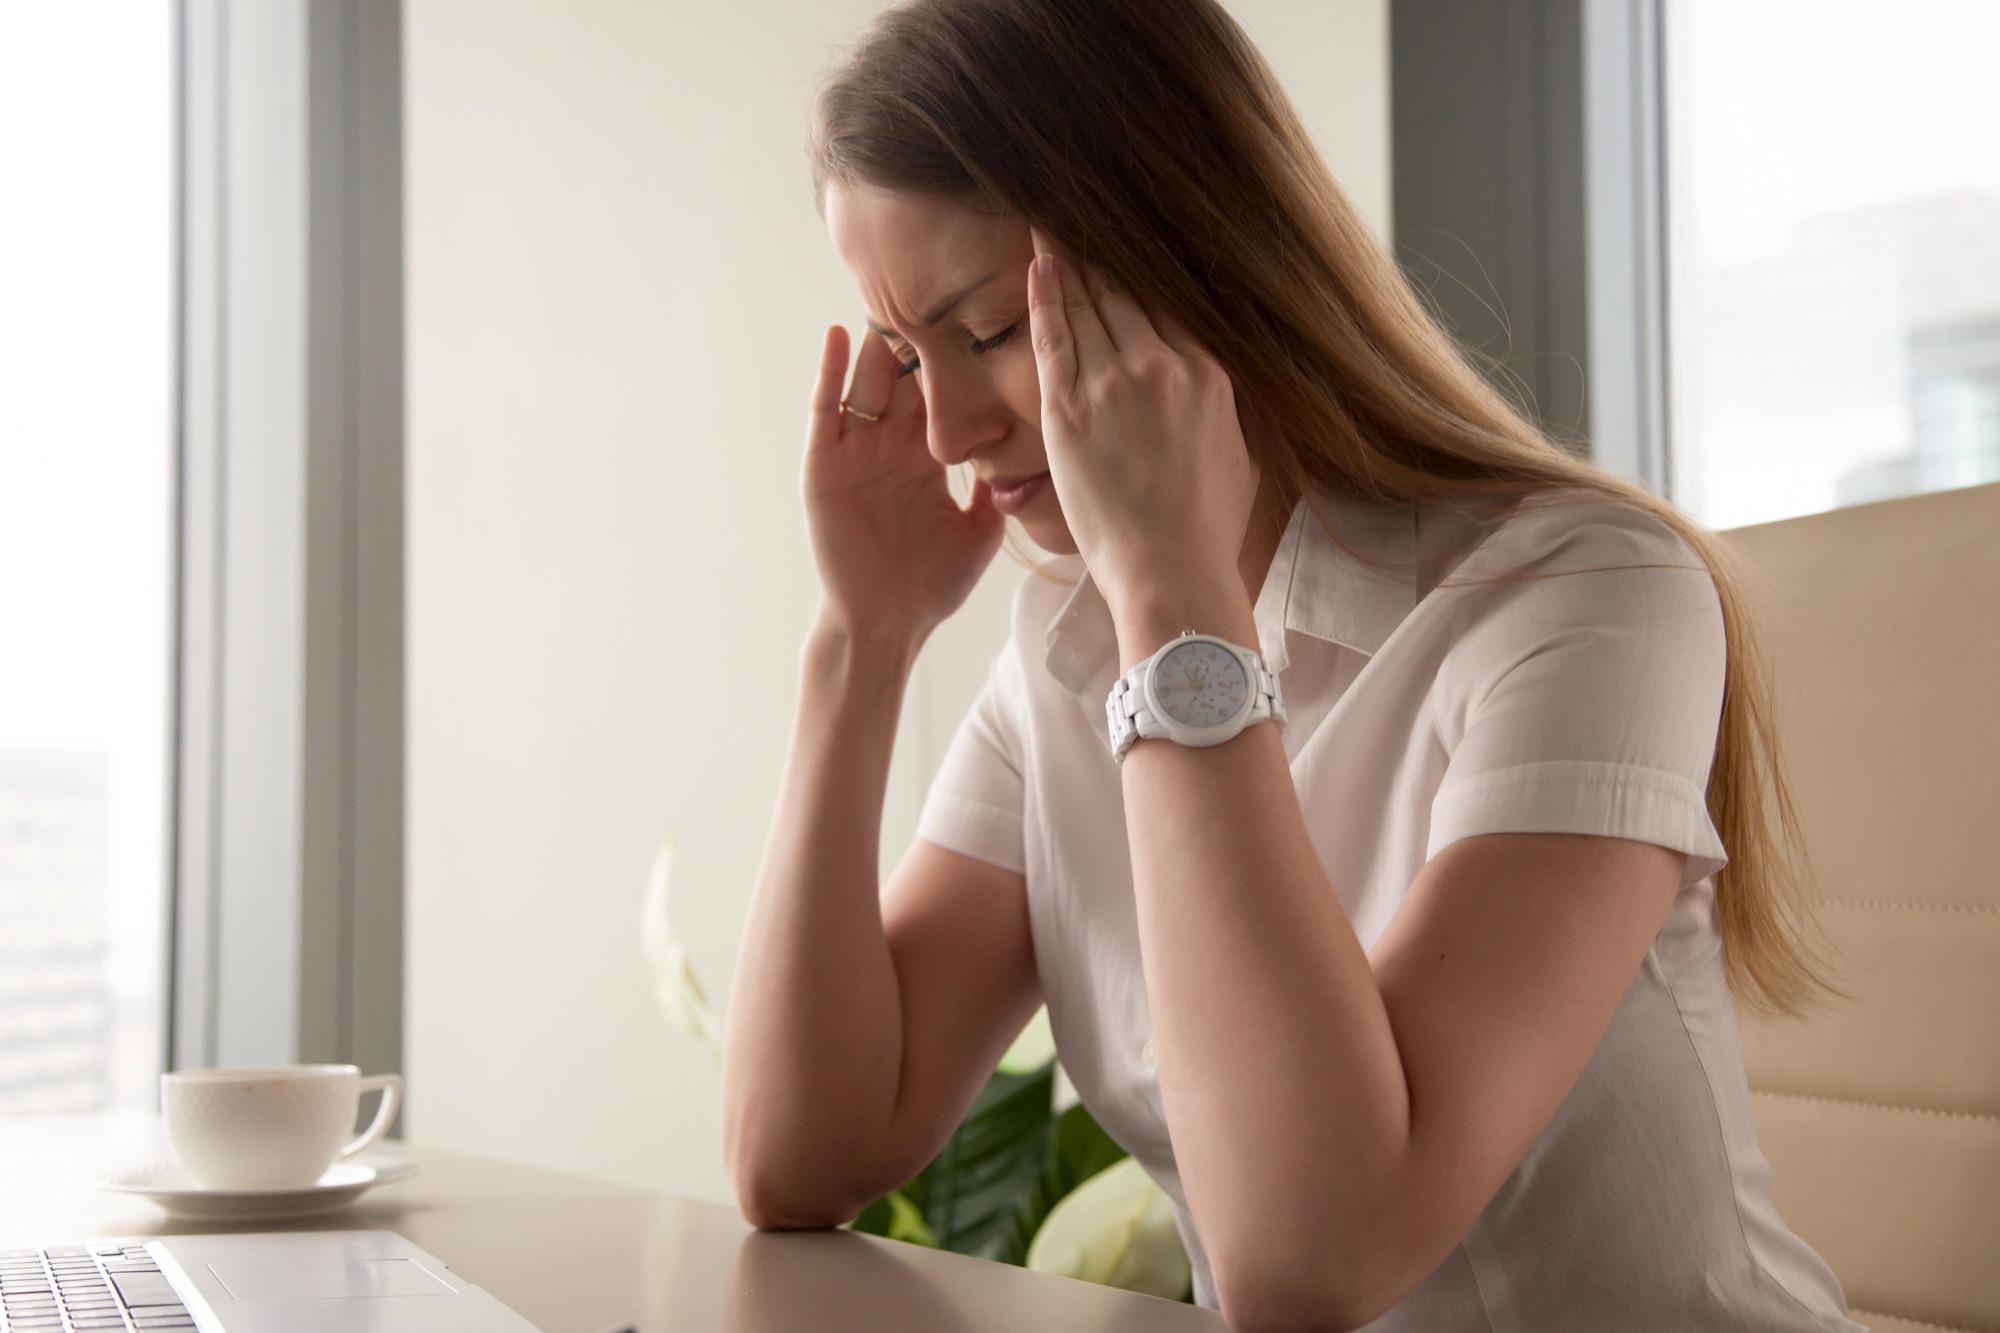 Alkohol Hilft Laut Studie Gegen Kopfschmerzen Brigitte De